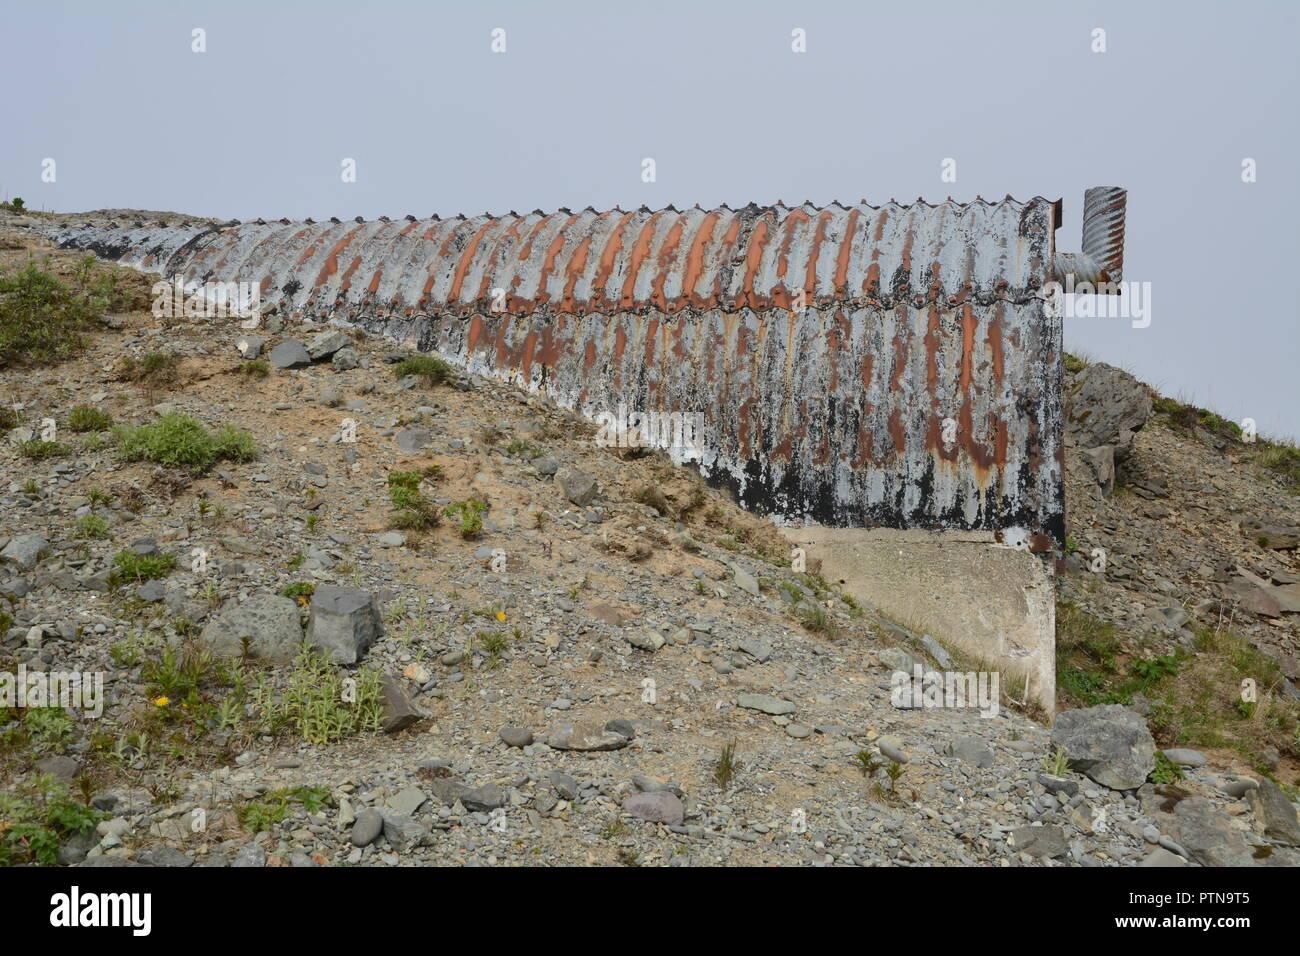 Entrance to a World War Two U.S. military base and bunker on Bunker Hill, over Dutch Harbor, Unalaska, Aleutian Islands, Alaska, USA. - Stock Image